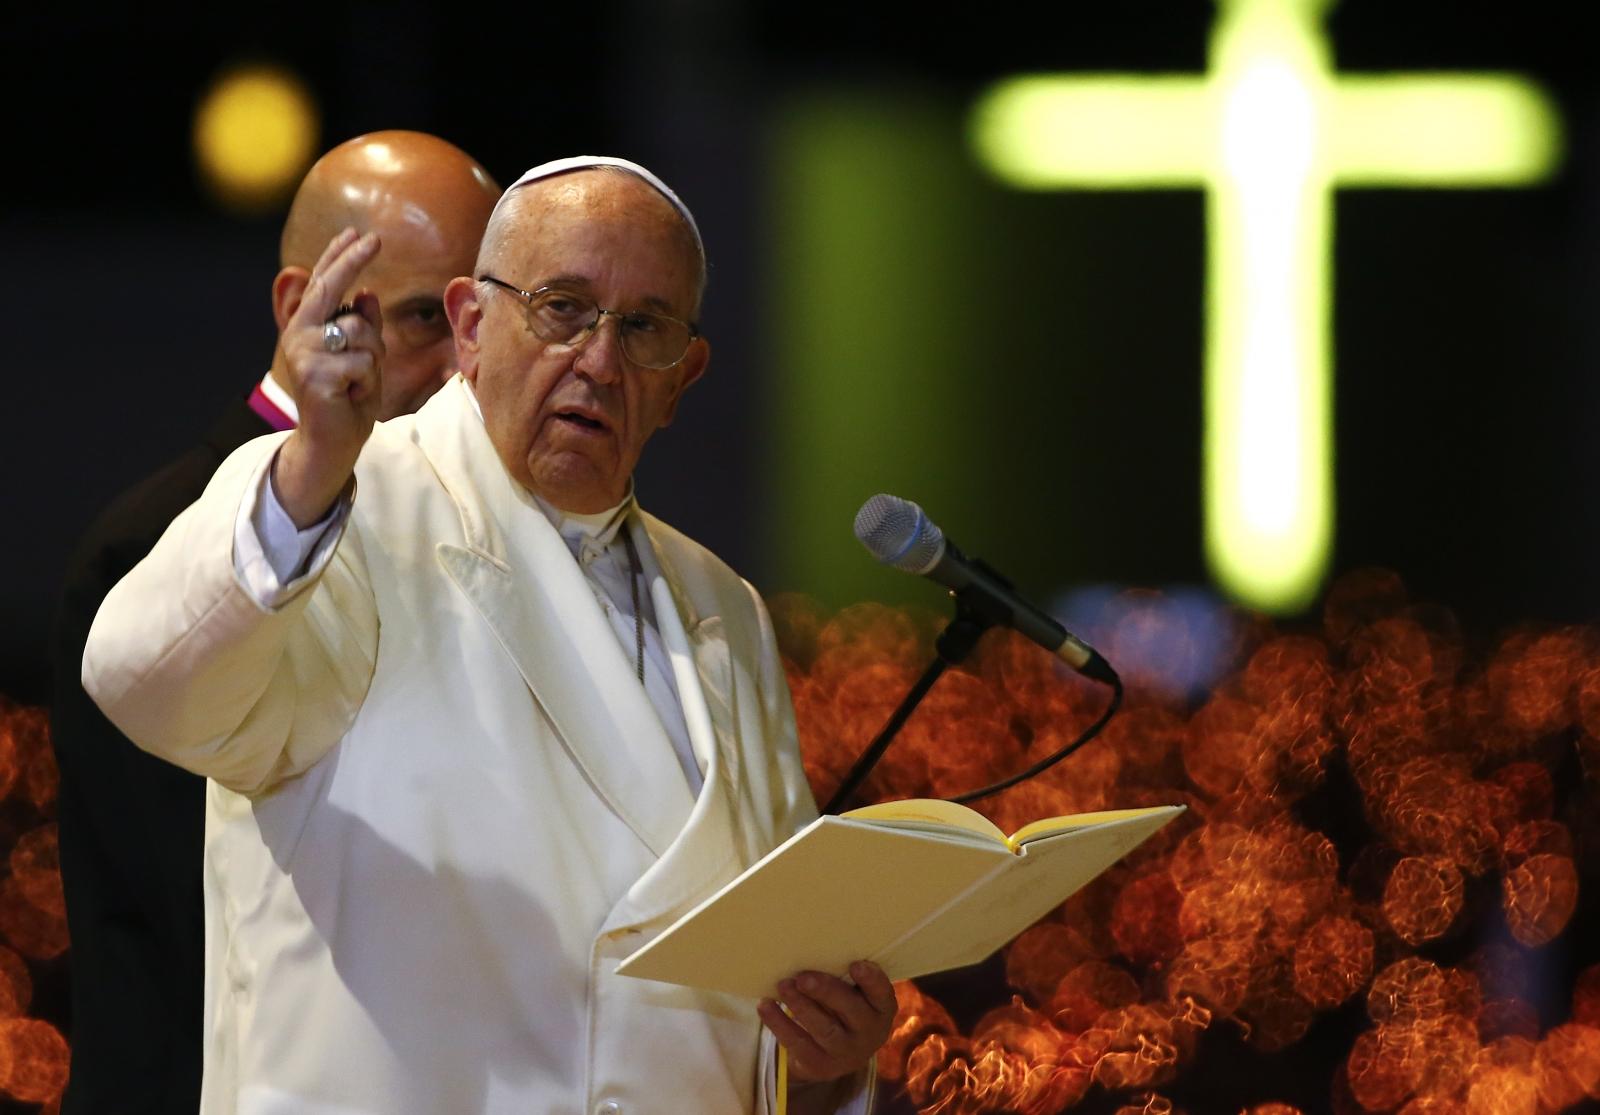 Pope Francis in Fatima